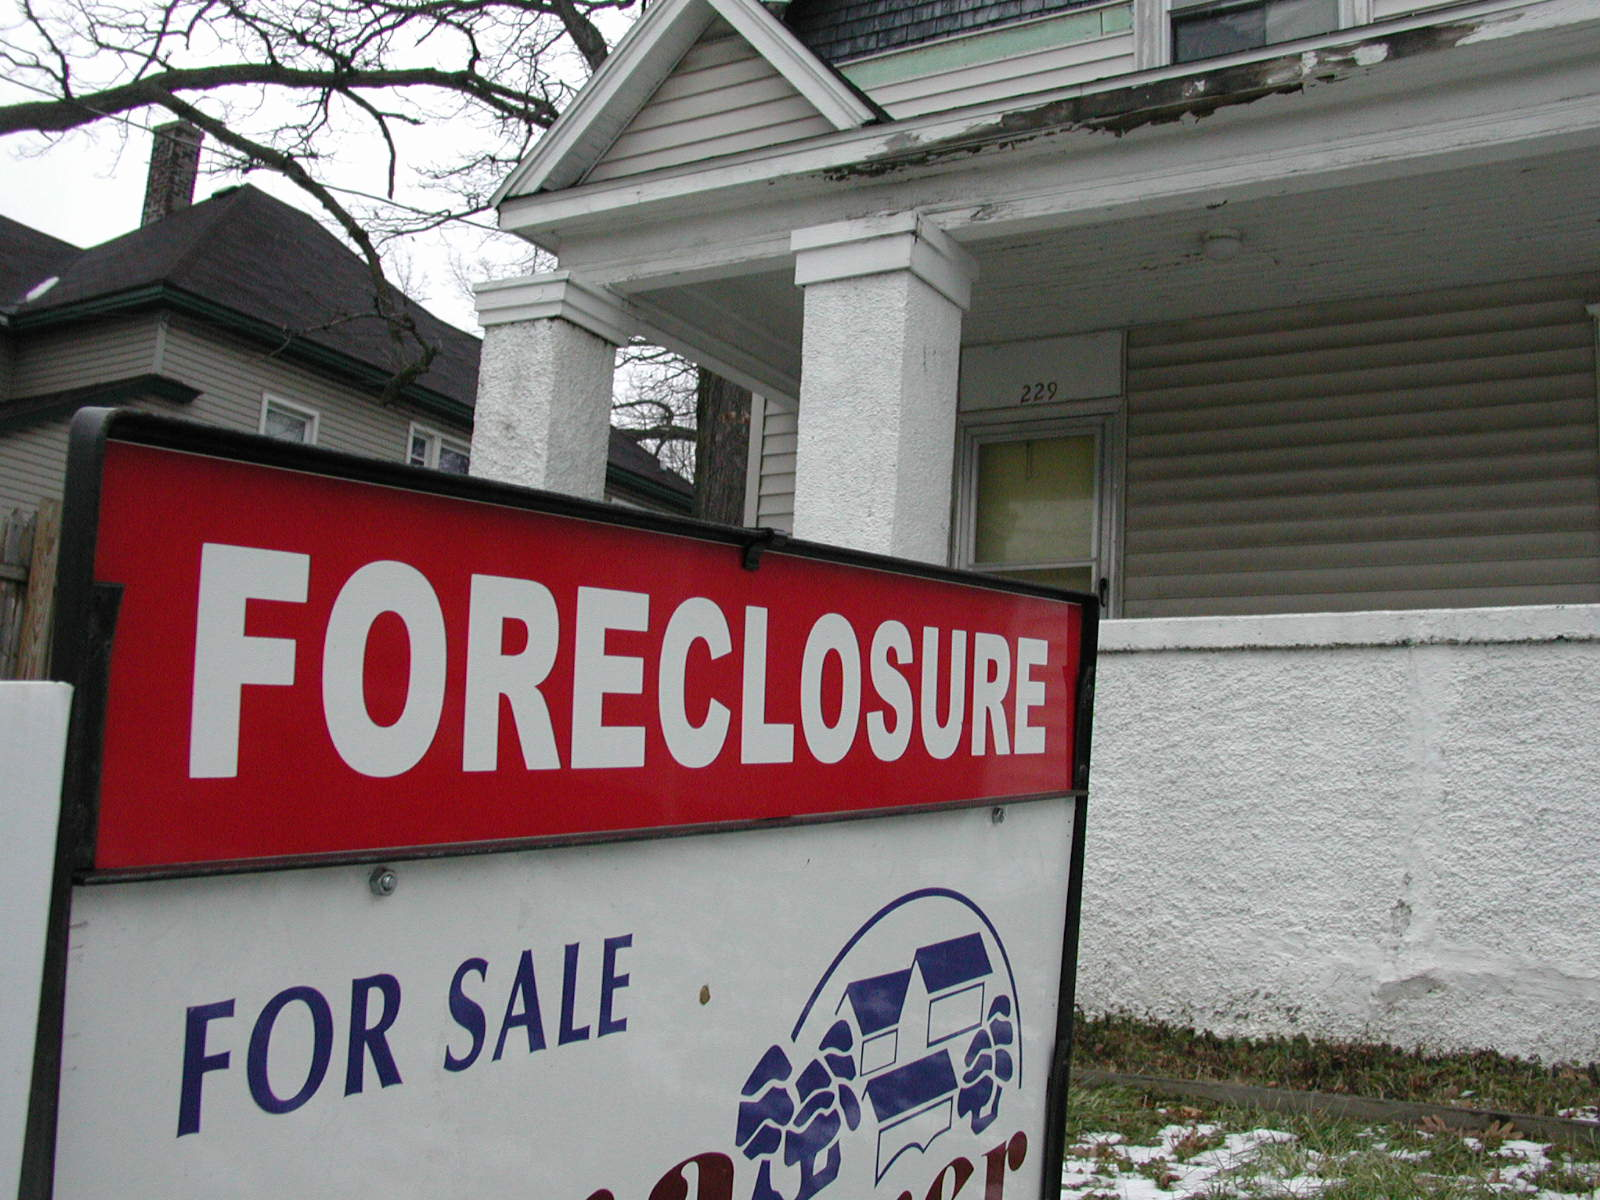 mortgage foreclosure fraud rampant in va virginia organizing